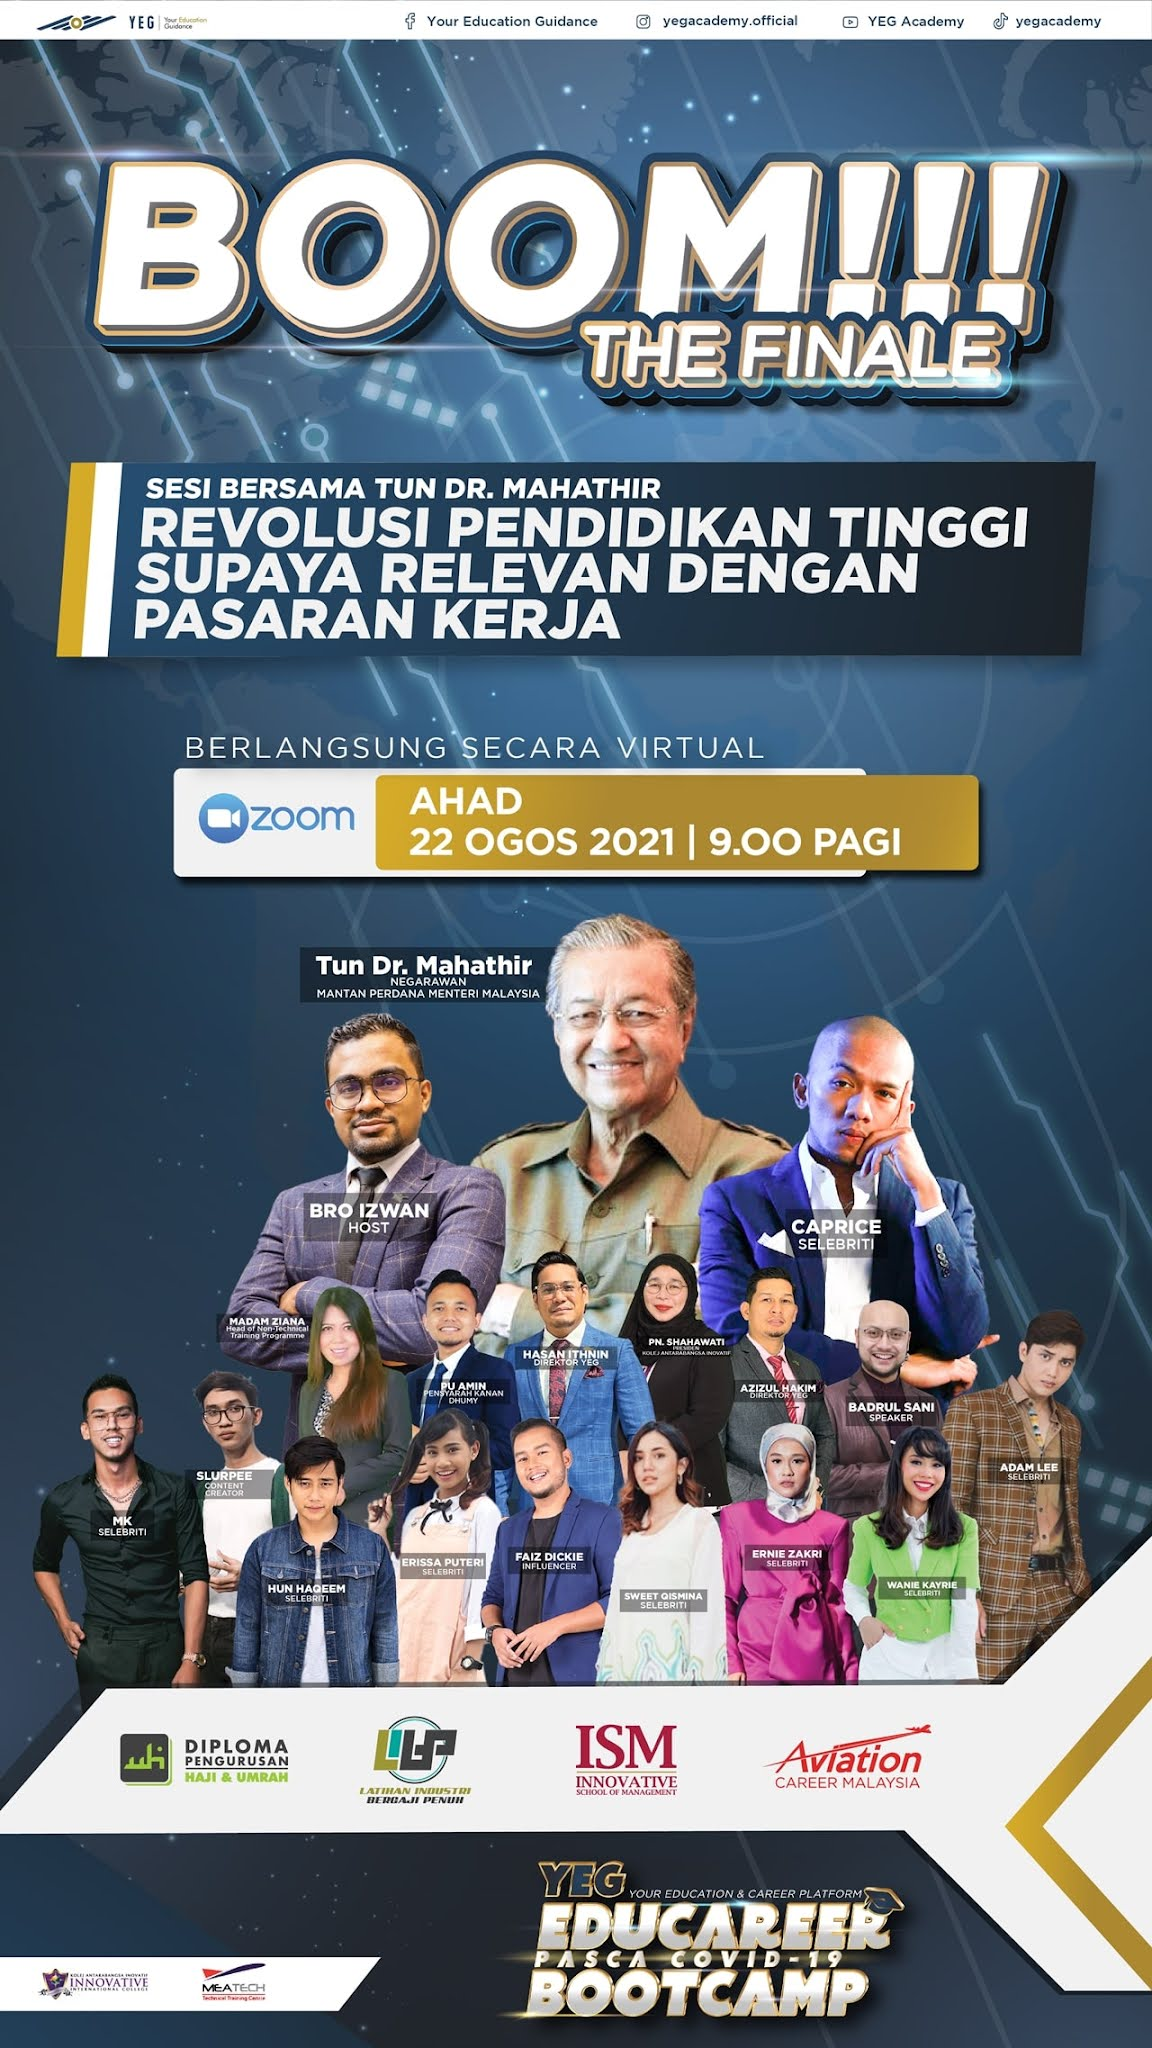 Tun Mahathir Beri Kupasan Eksklusif Kepada Bakal Graduan Di Platform YEG Academy